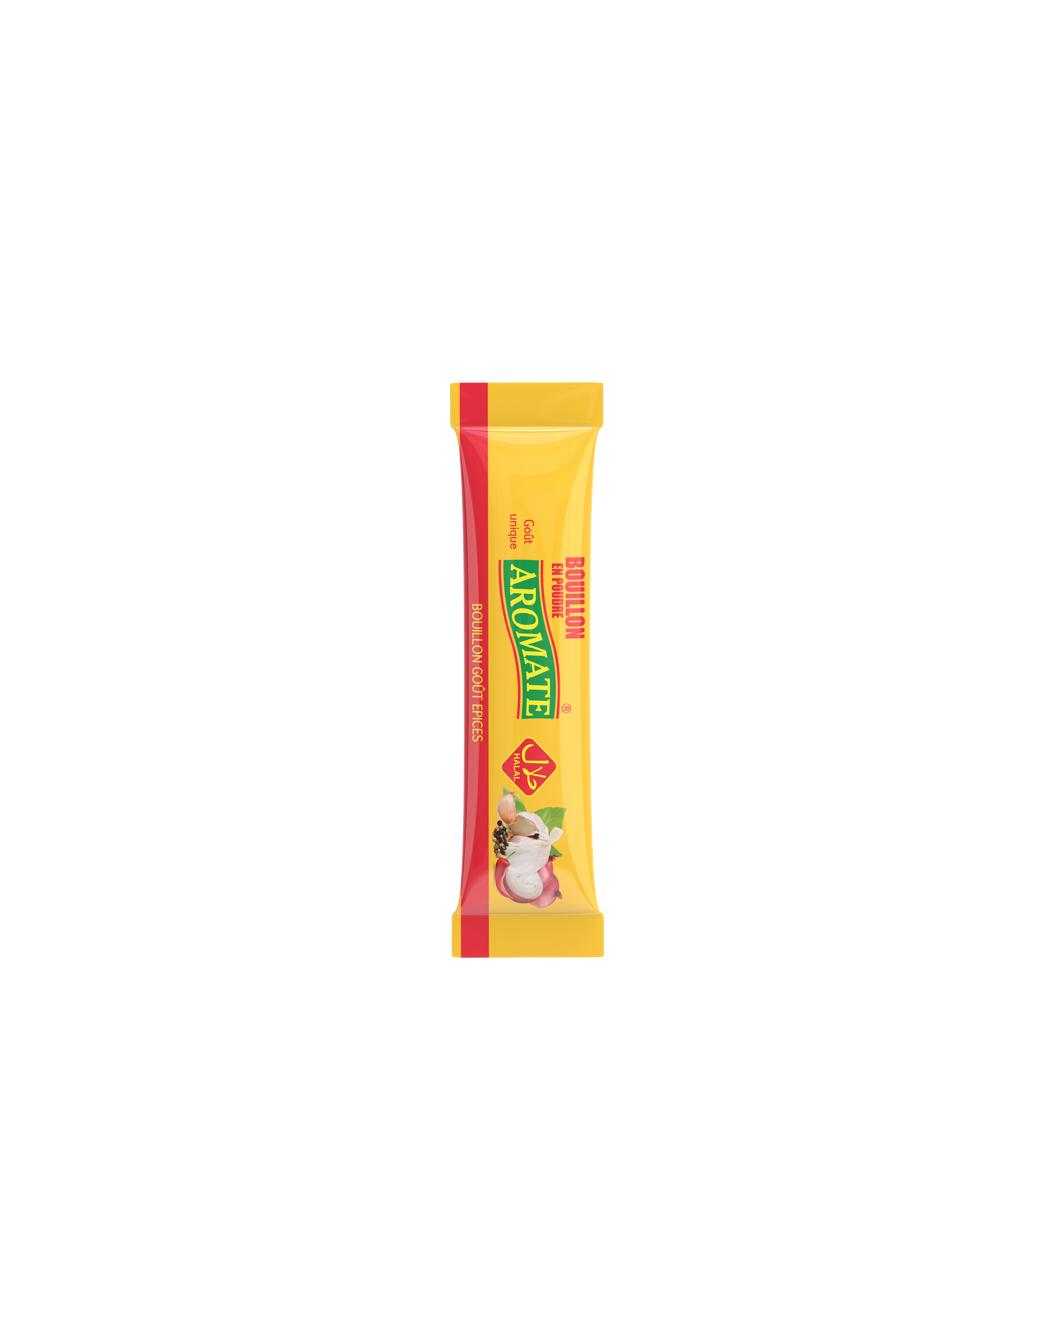 Bouillon AROMATE Epices_Stick 15g_Siprochim